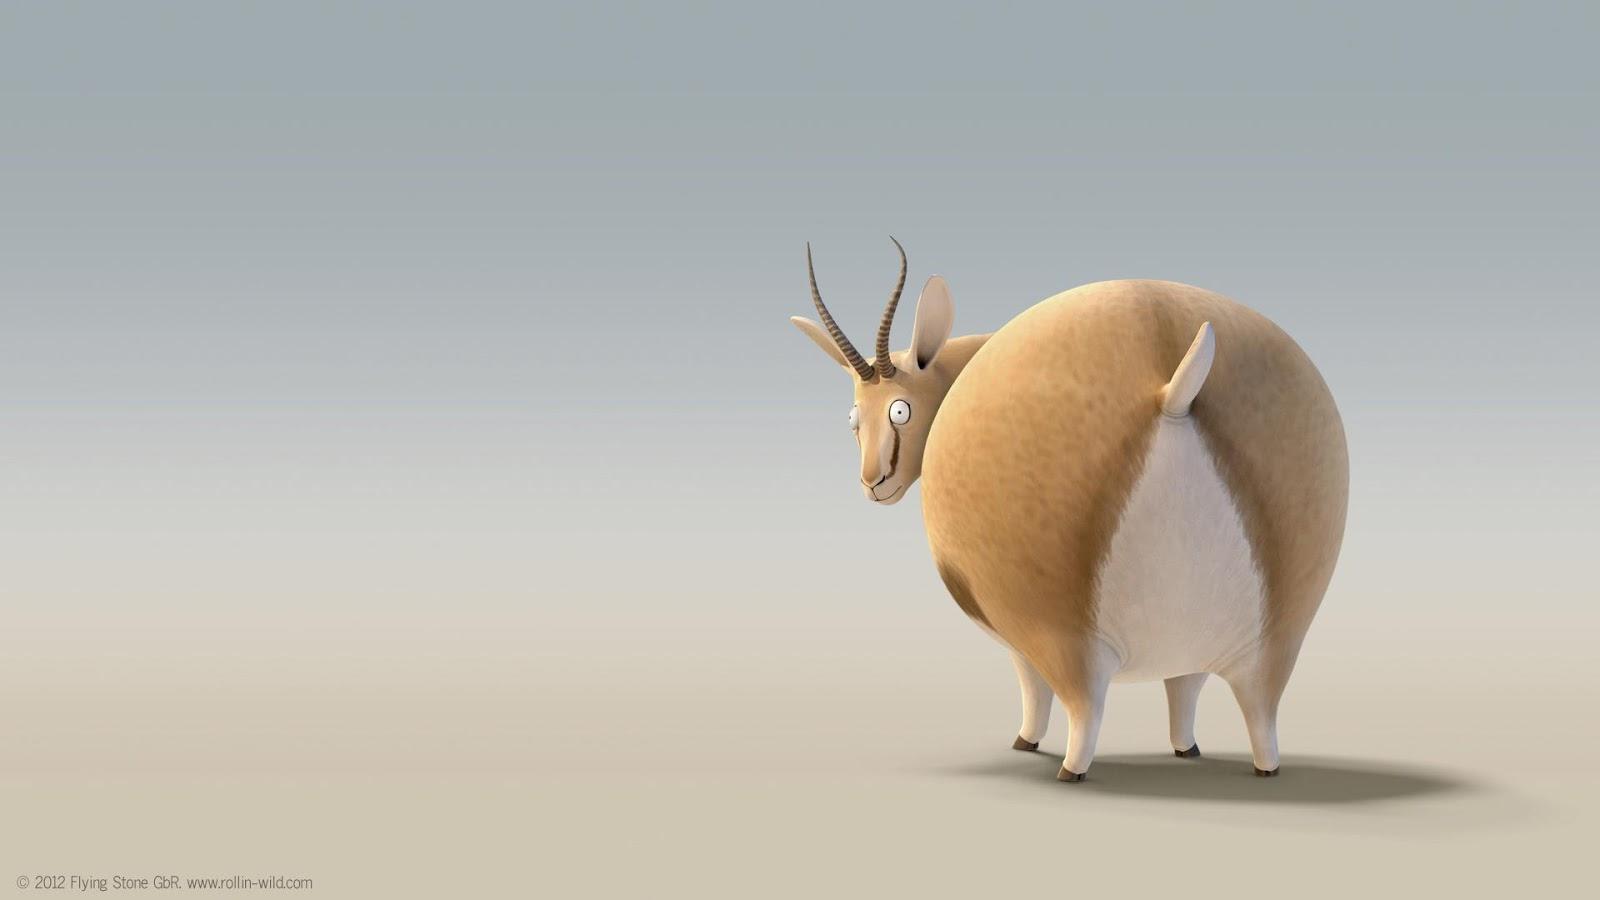 Rollin Wild Animasi Lucu Hewan Hewan Gendut Q Doh Community